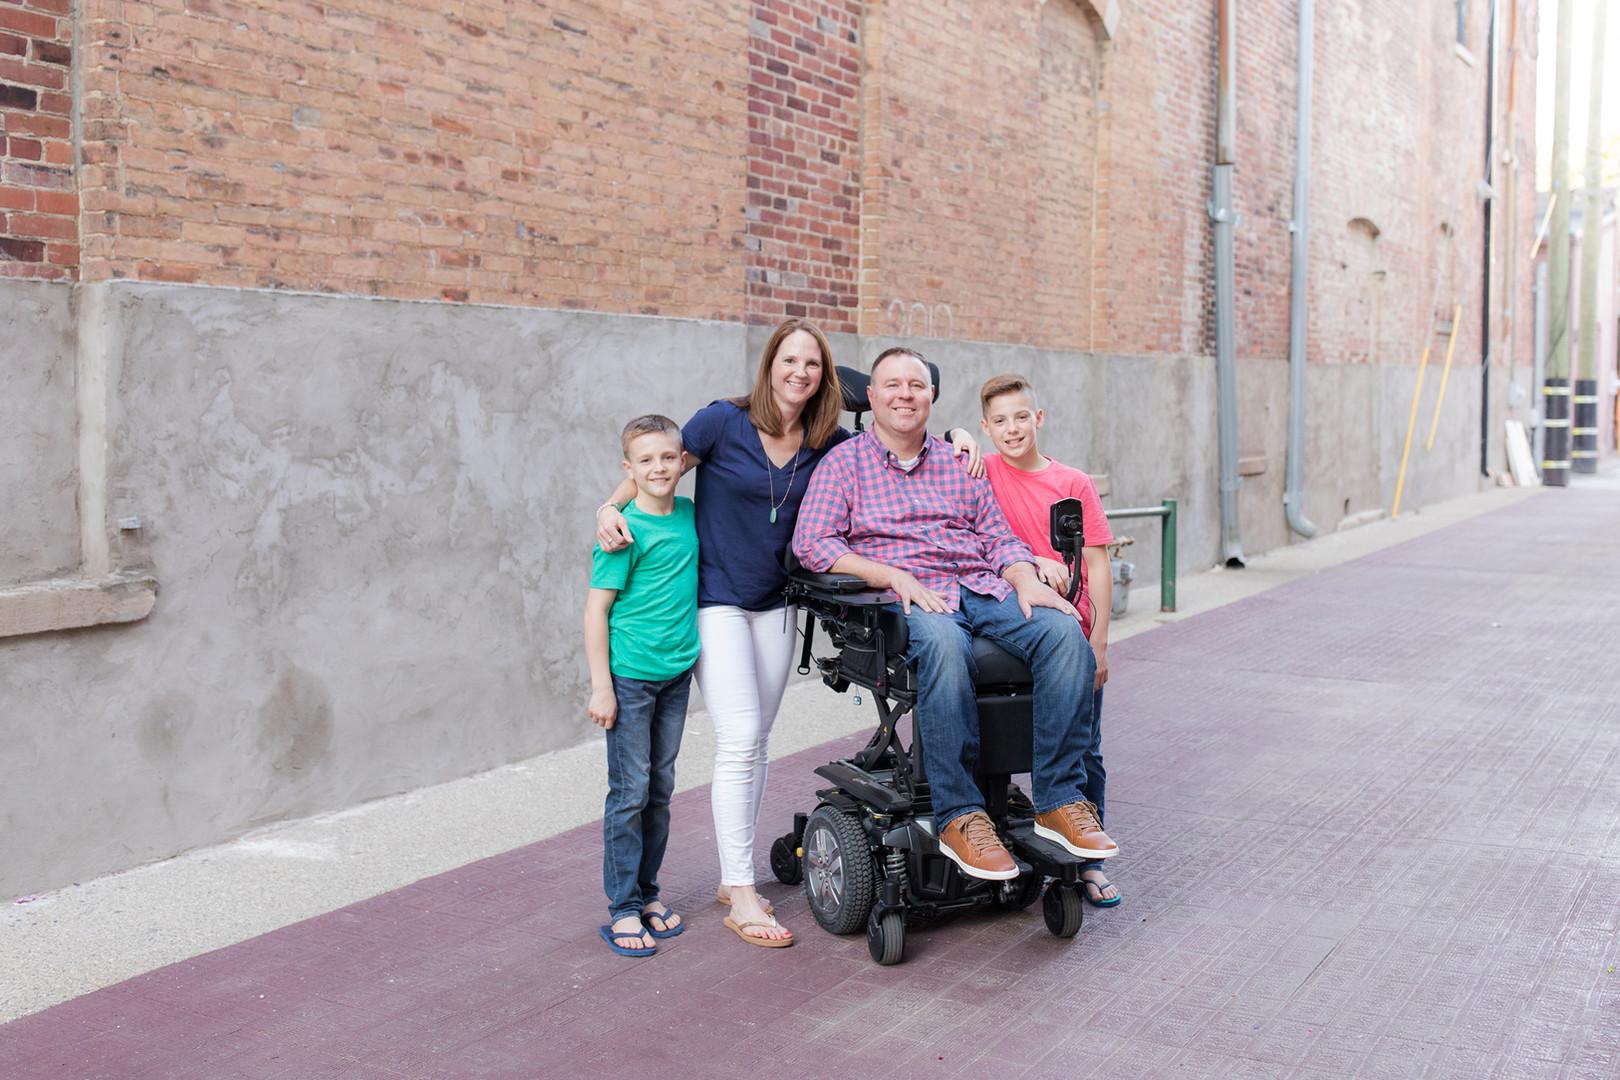 Jeff Homan & Family